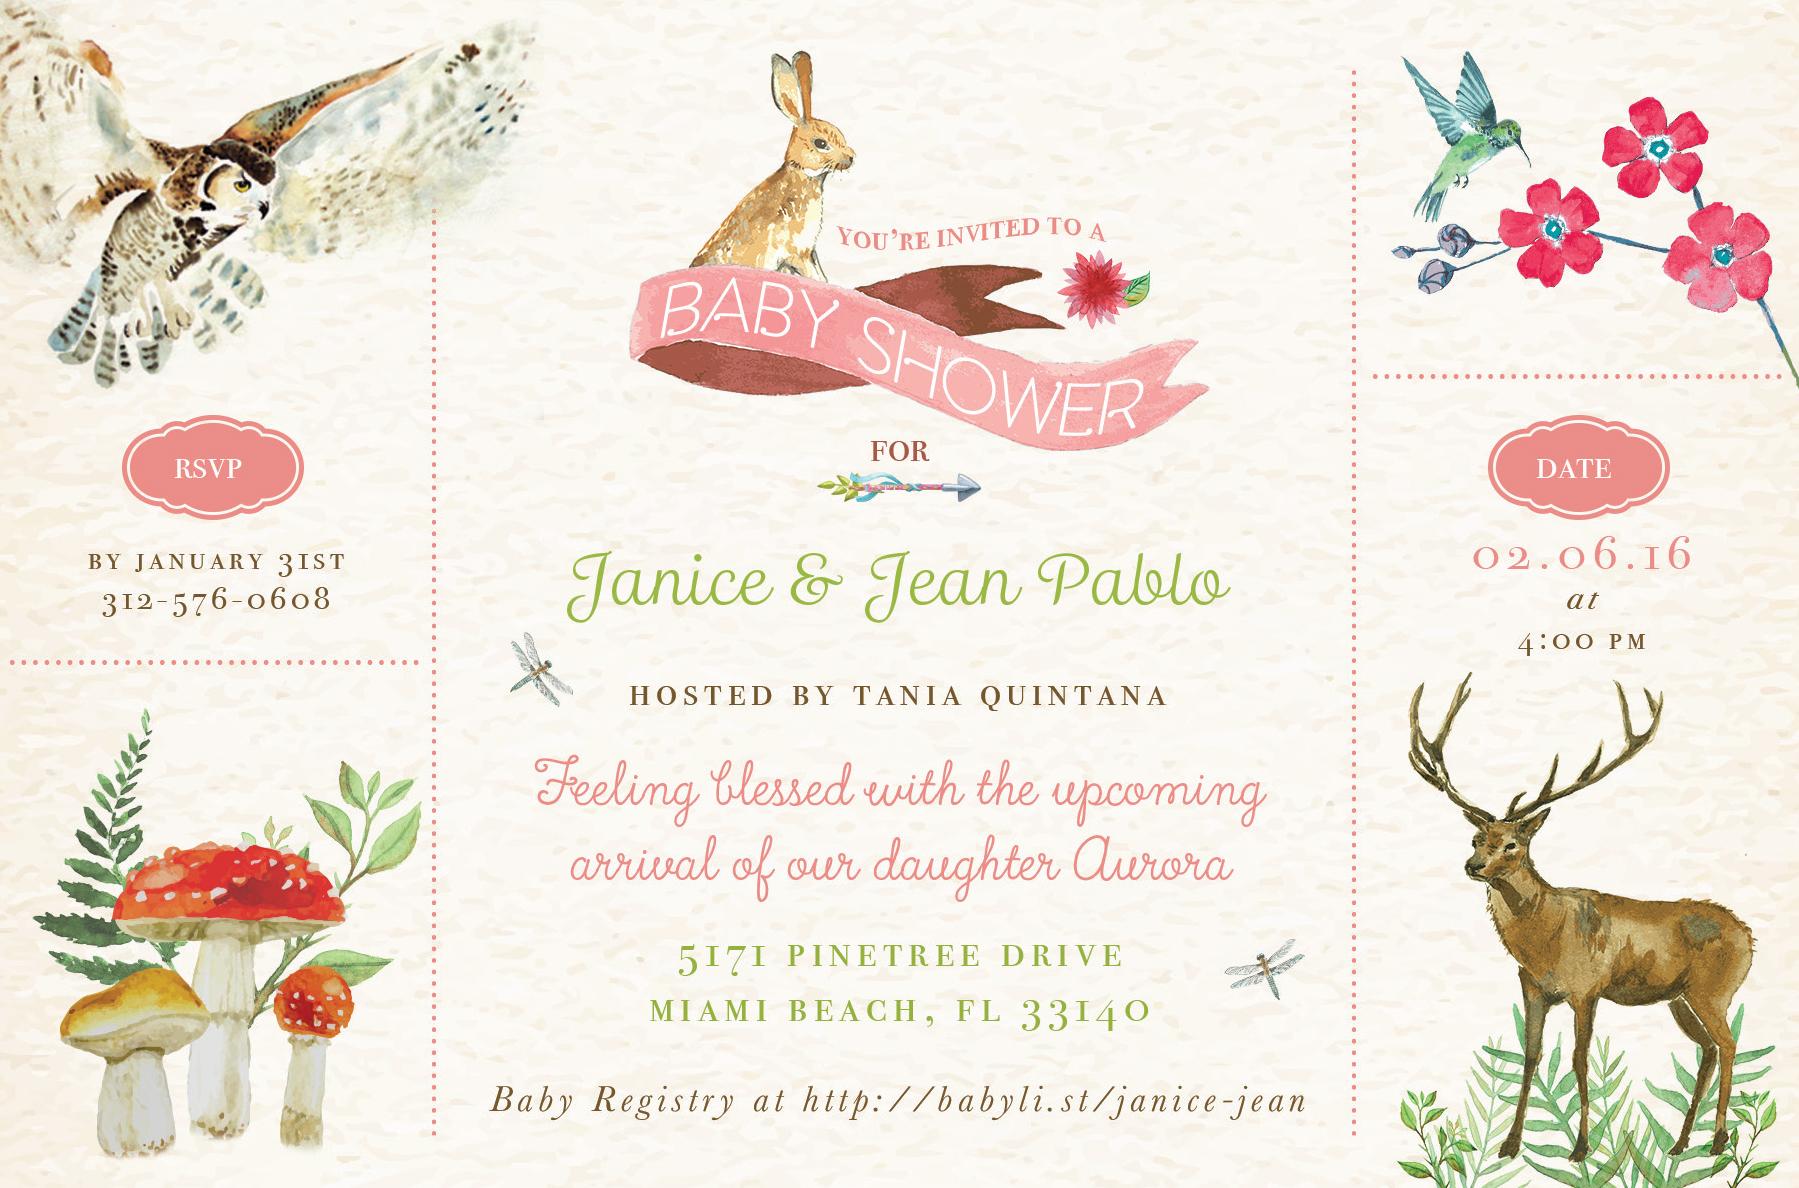 1799x1188 Baby Shower Invitation Nicole Andujar